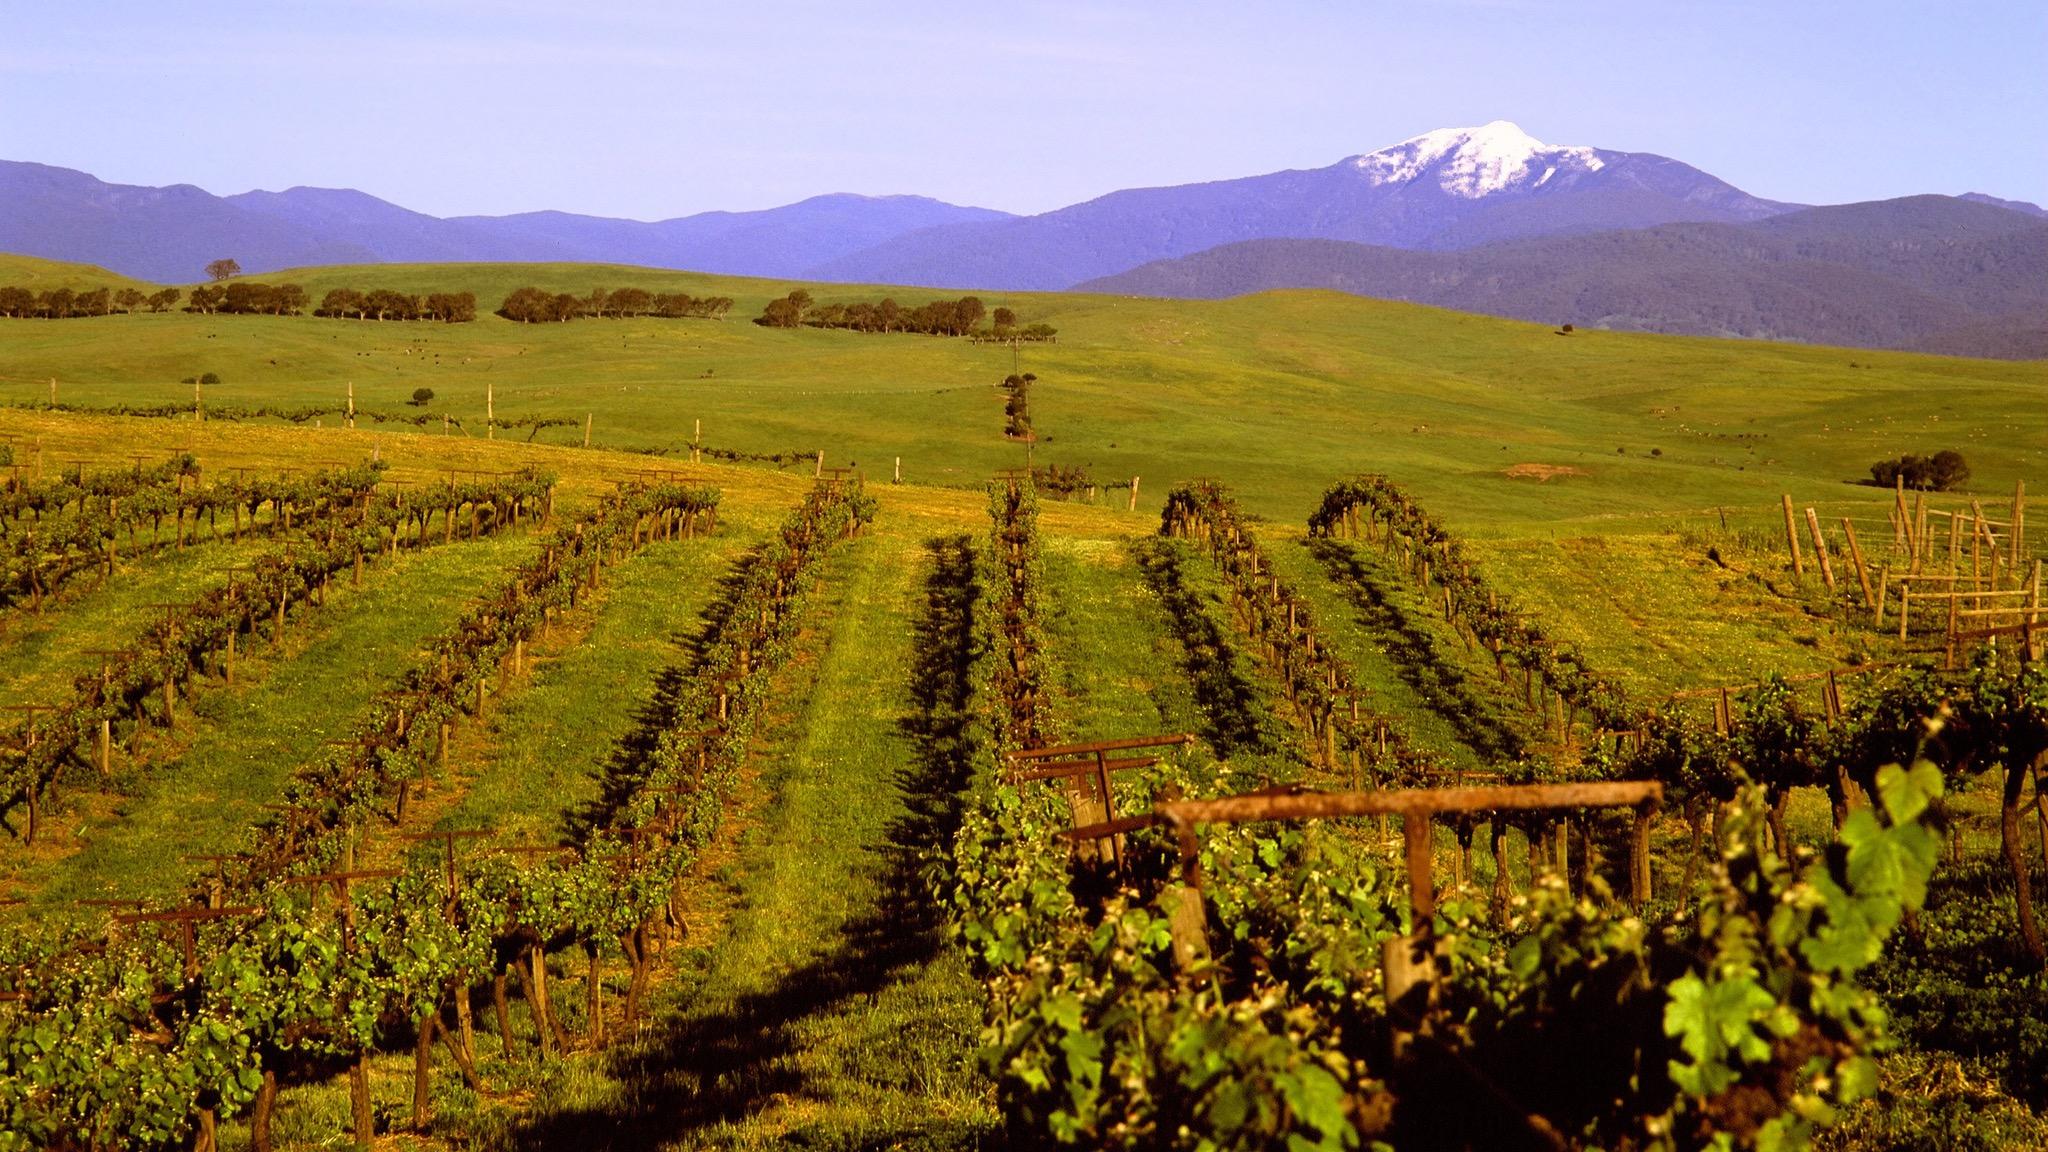 Mt Buller view from vineyard